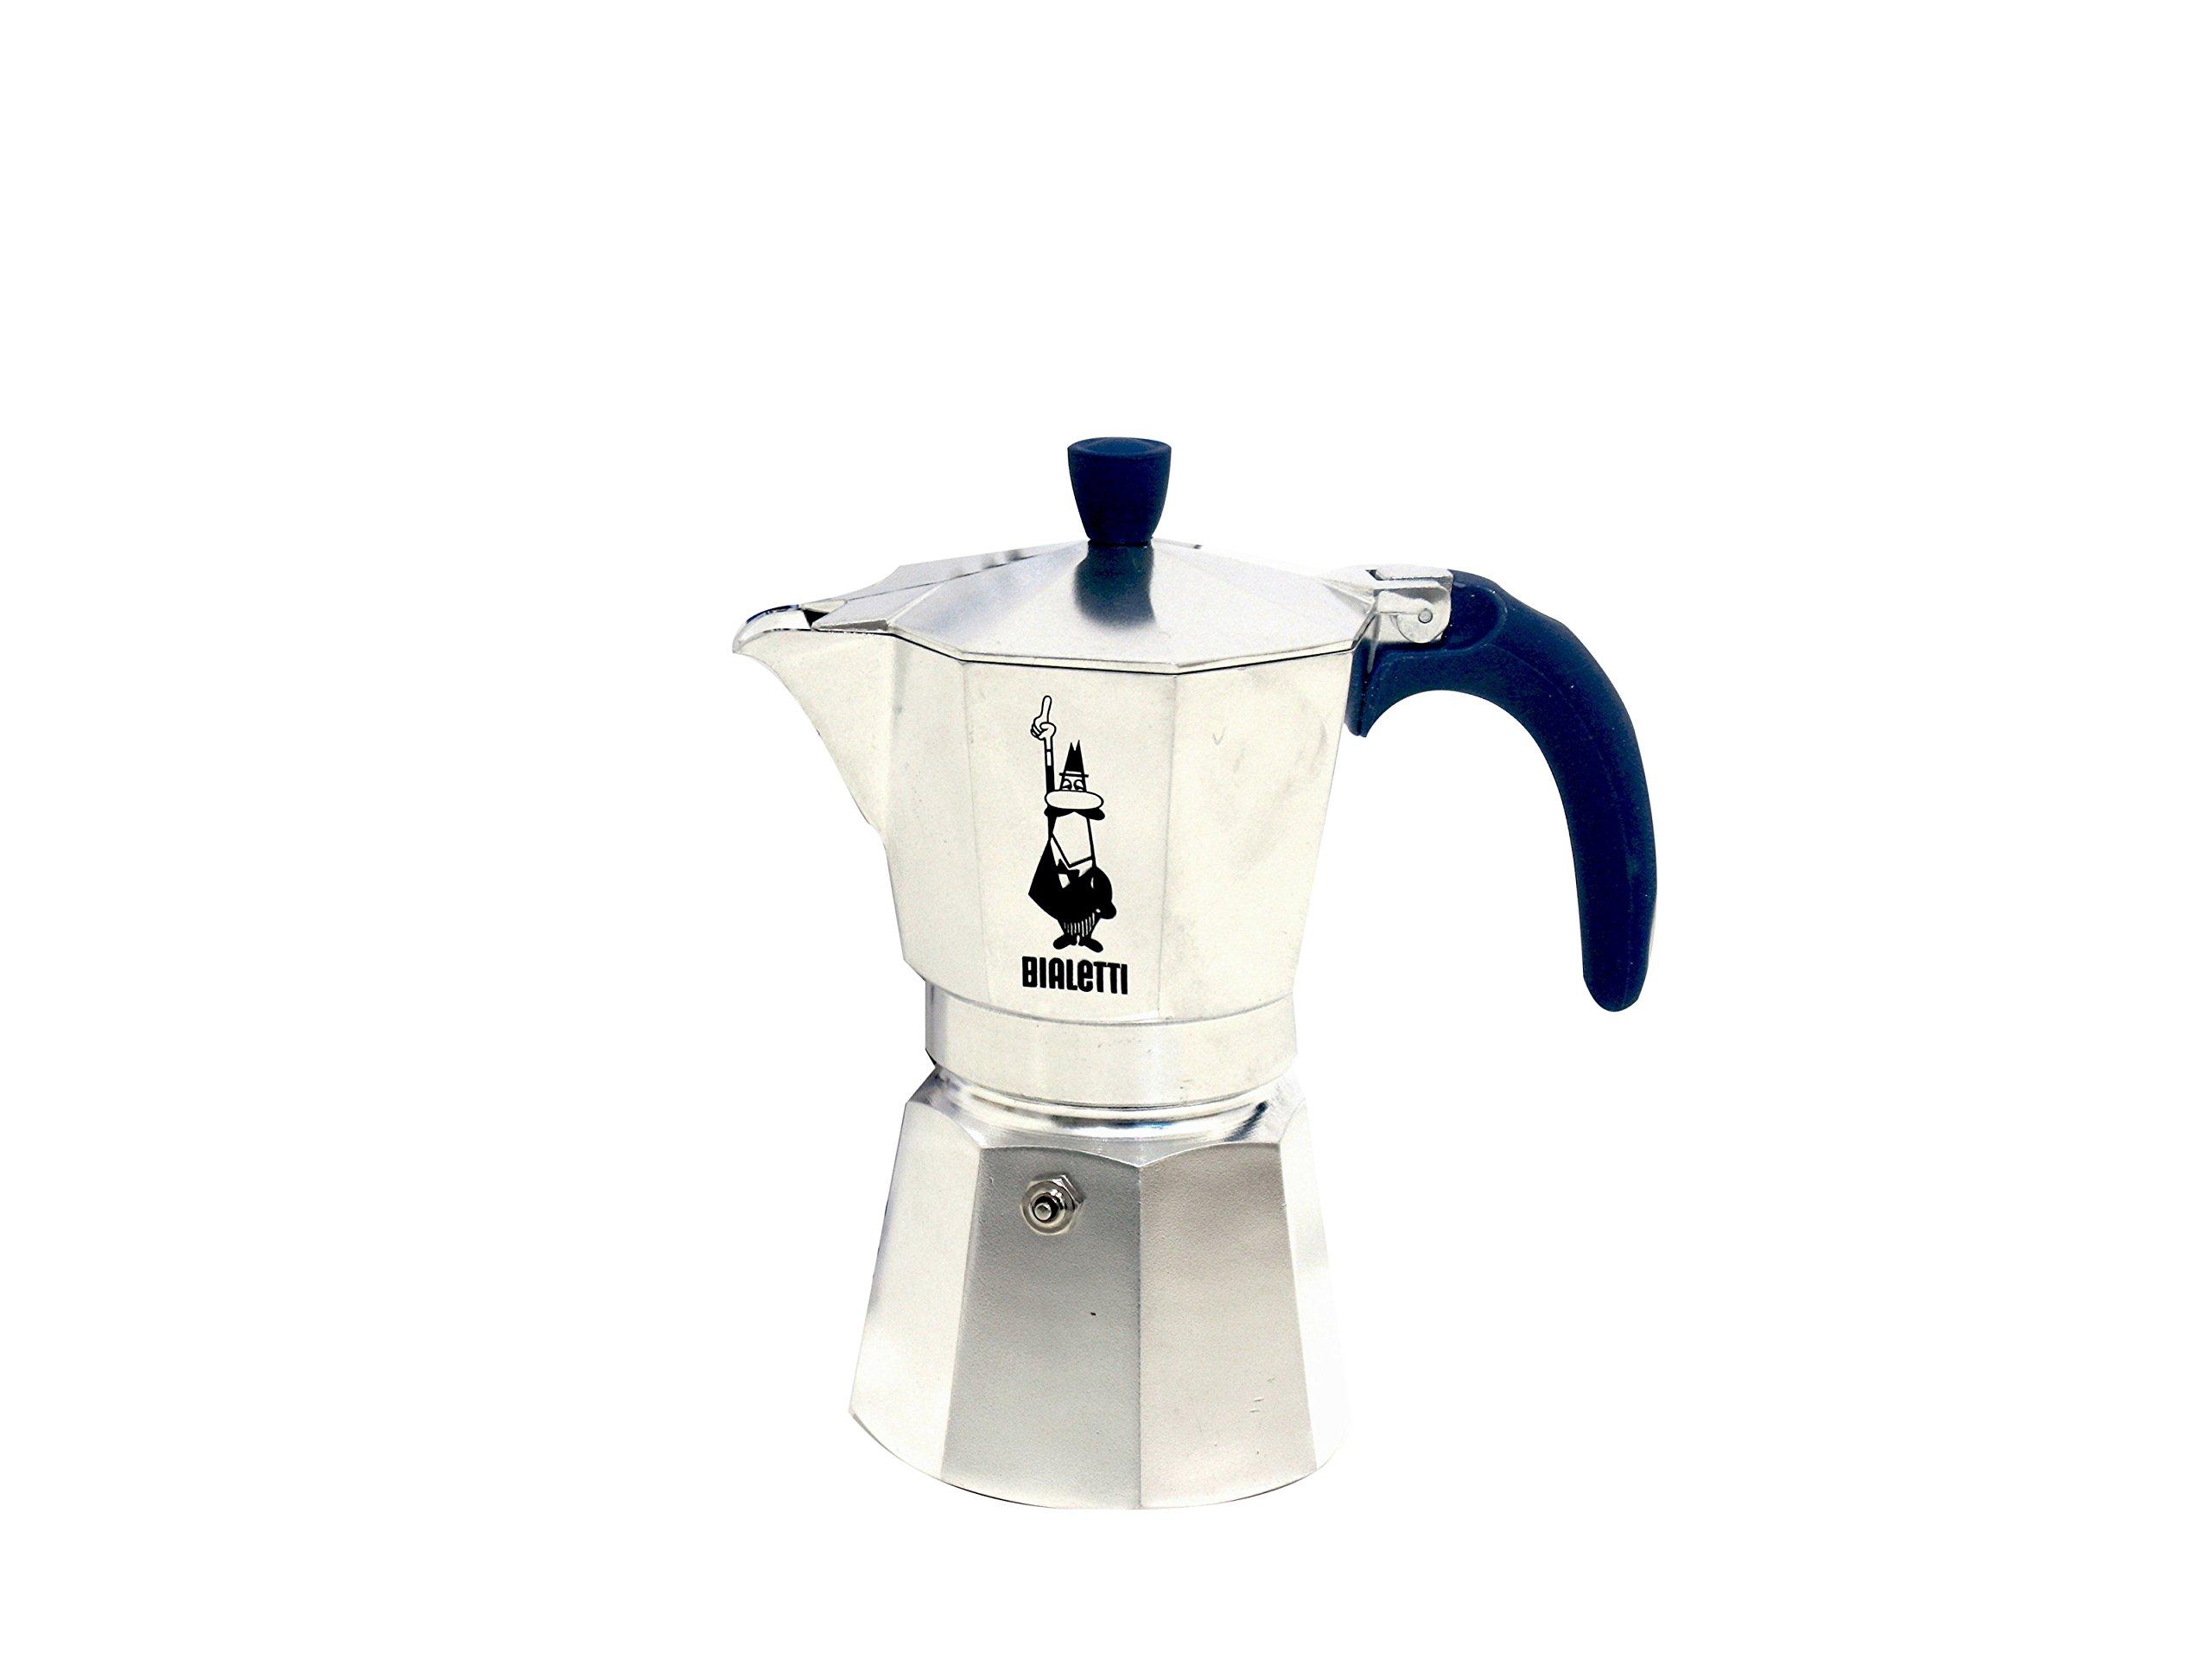 Bialetti Moka Express - Aluminium 6 cups with blue handle